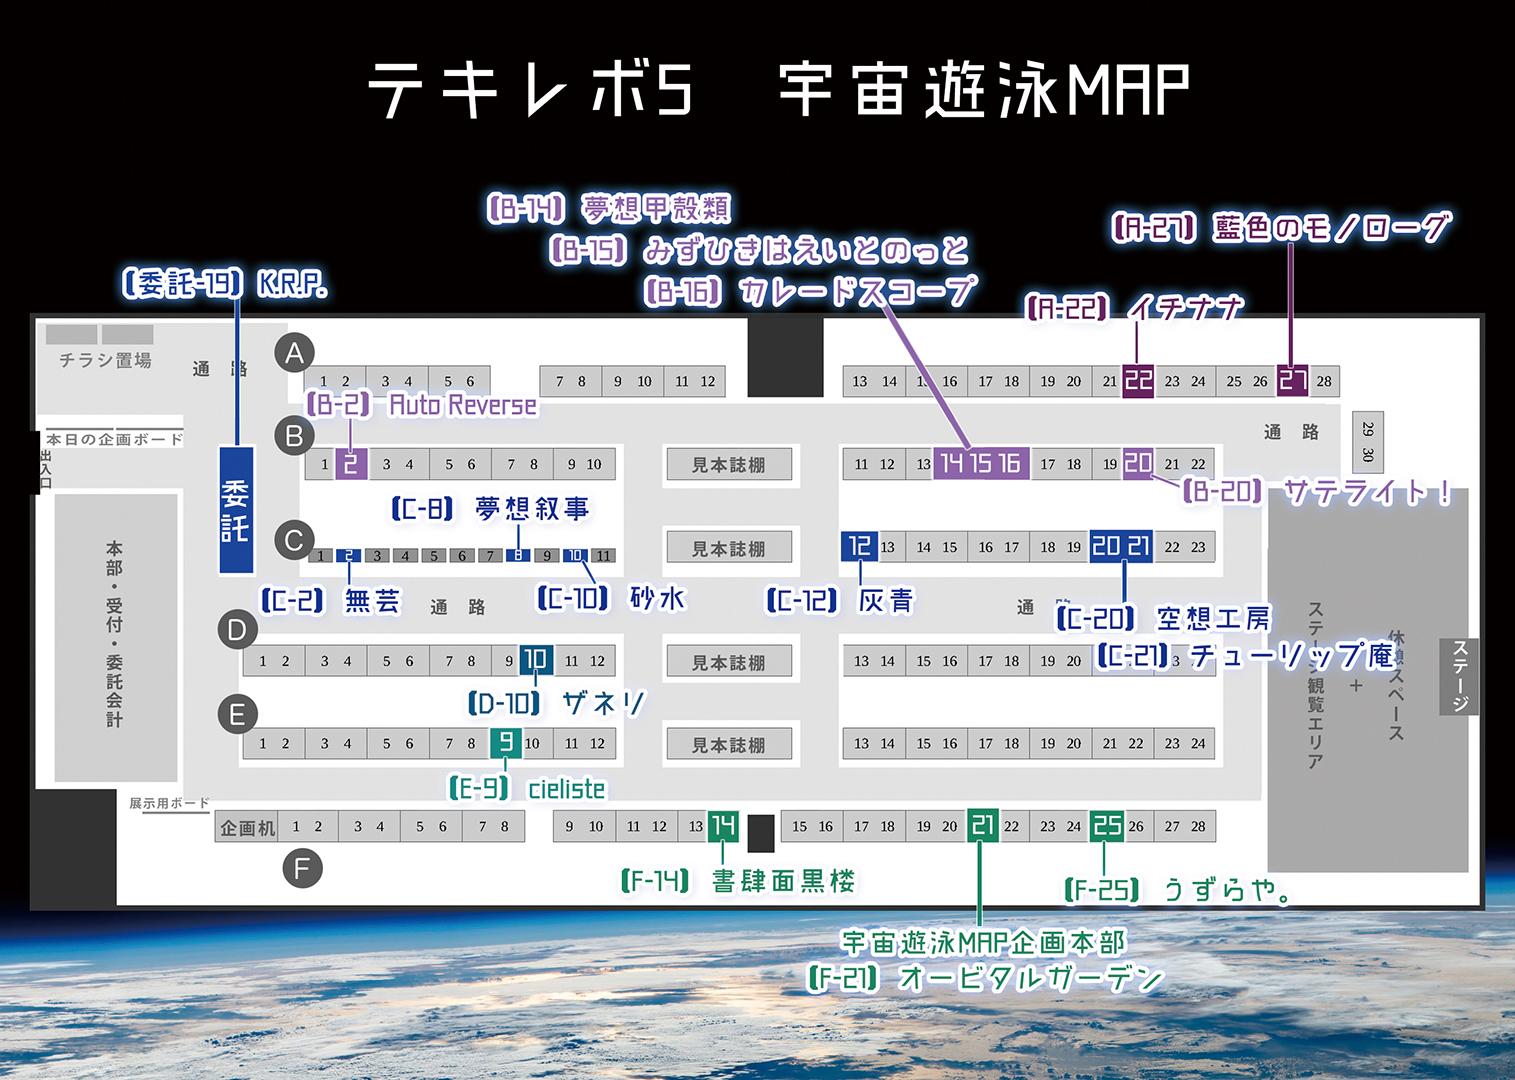 宇宙遊泳MAP